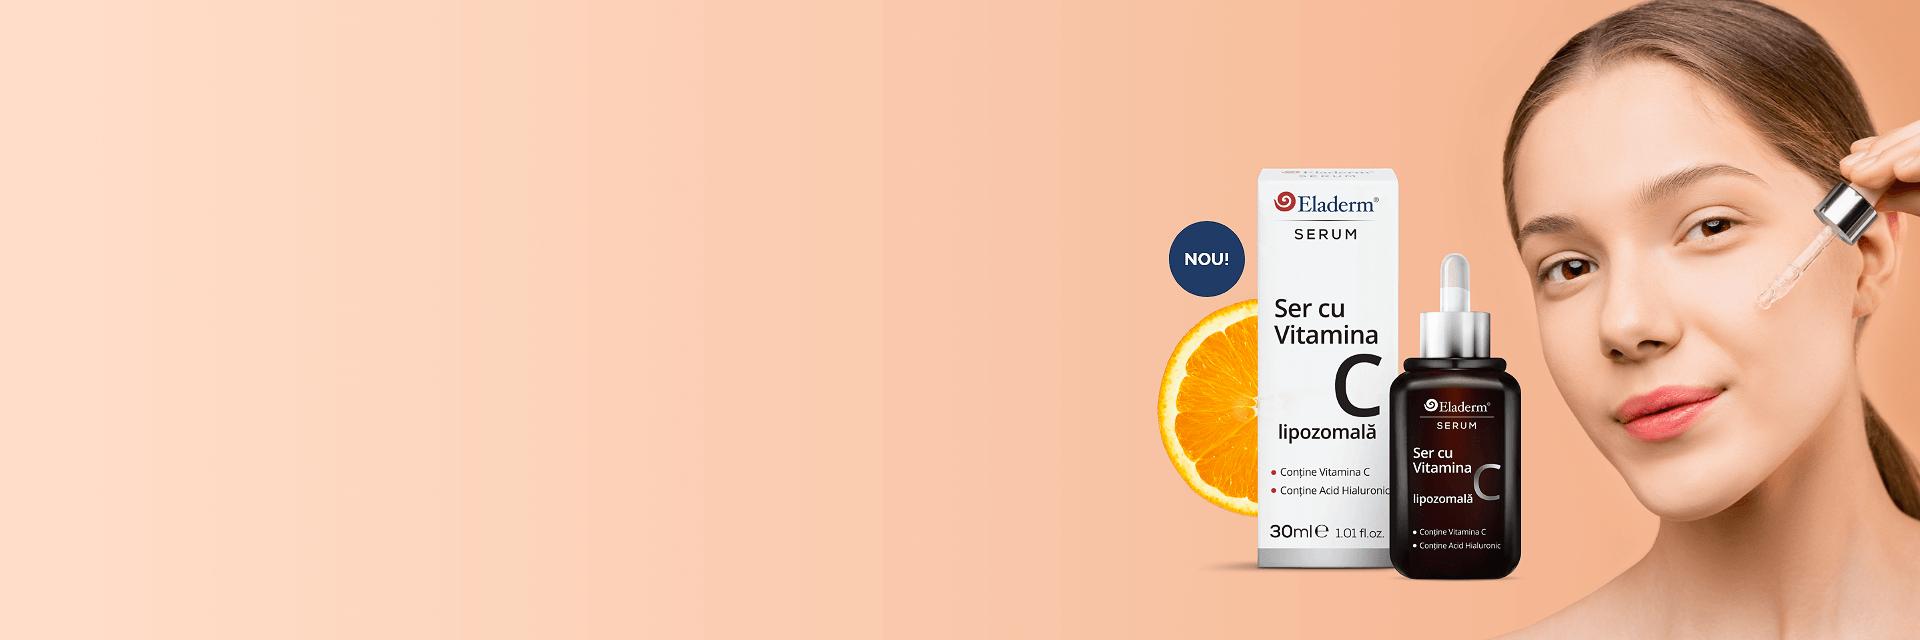 11. NOU: Ser Vitamina C